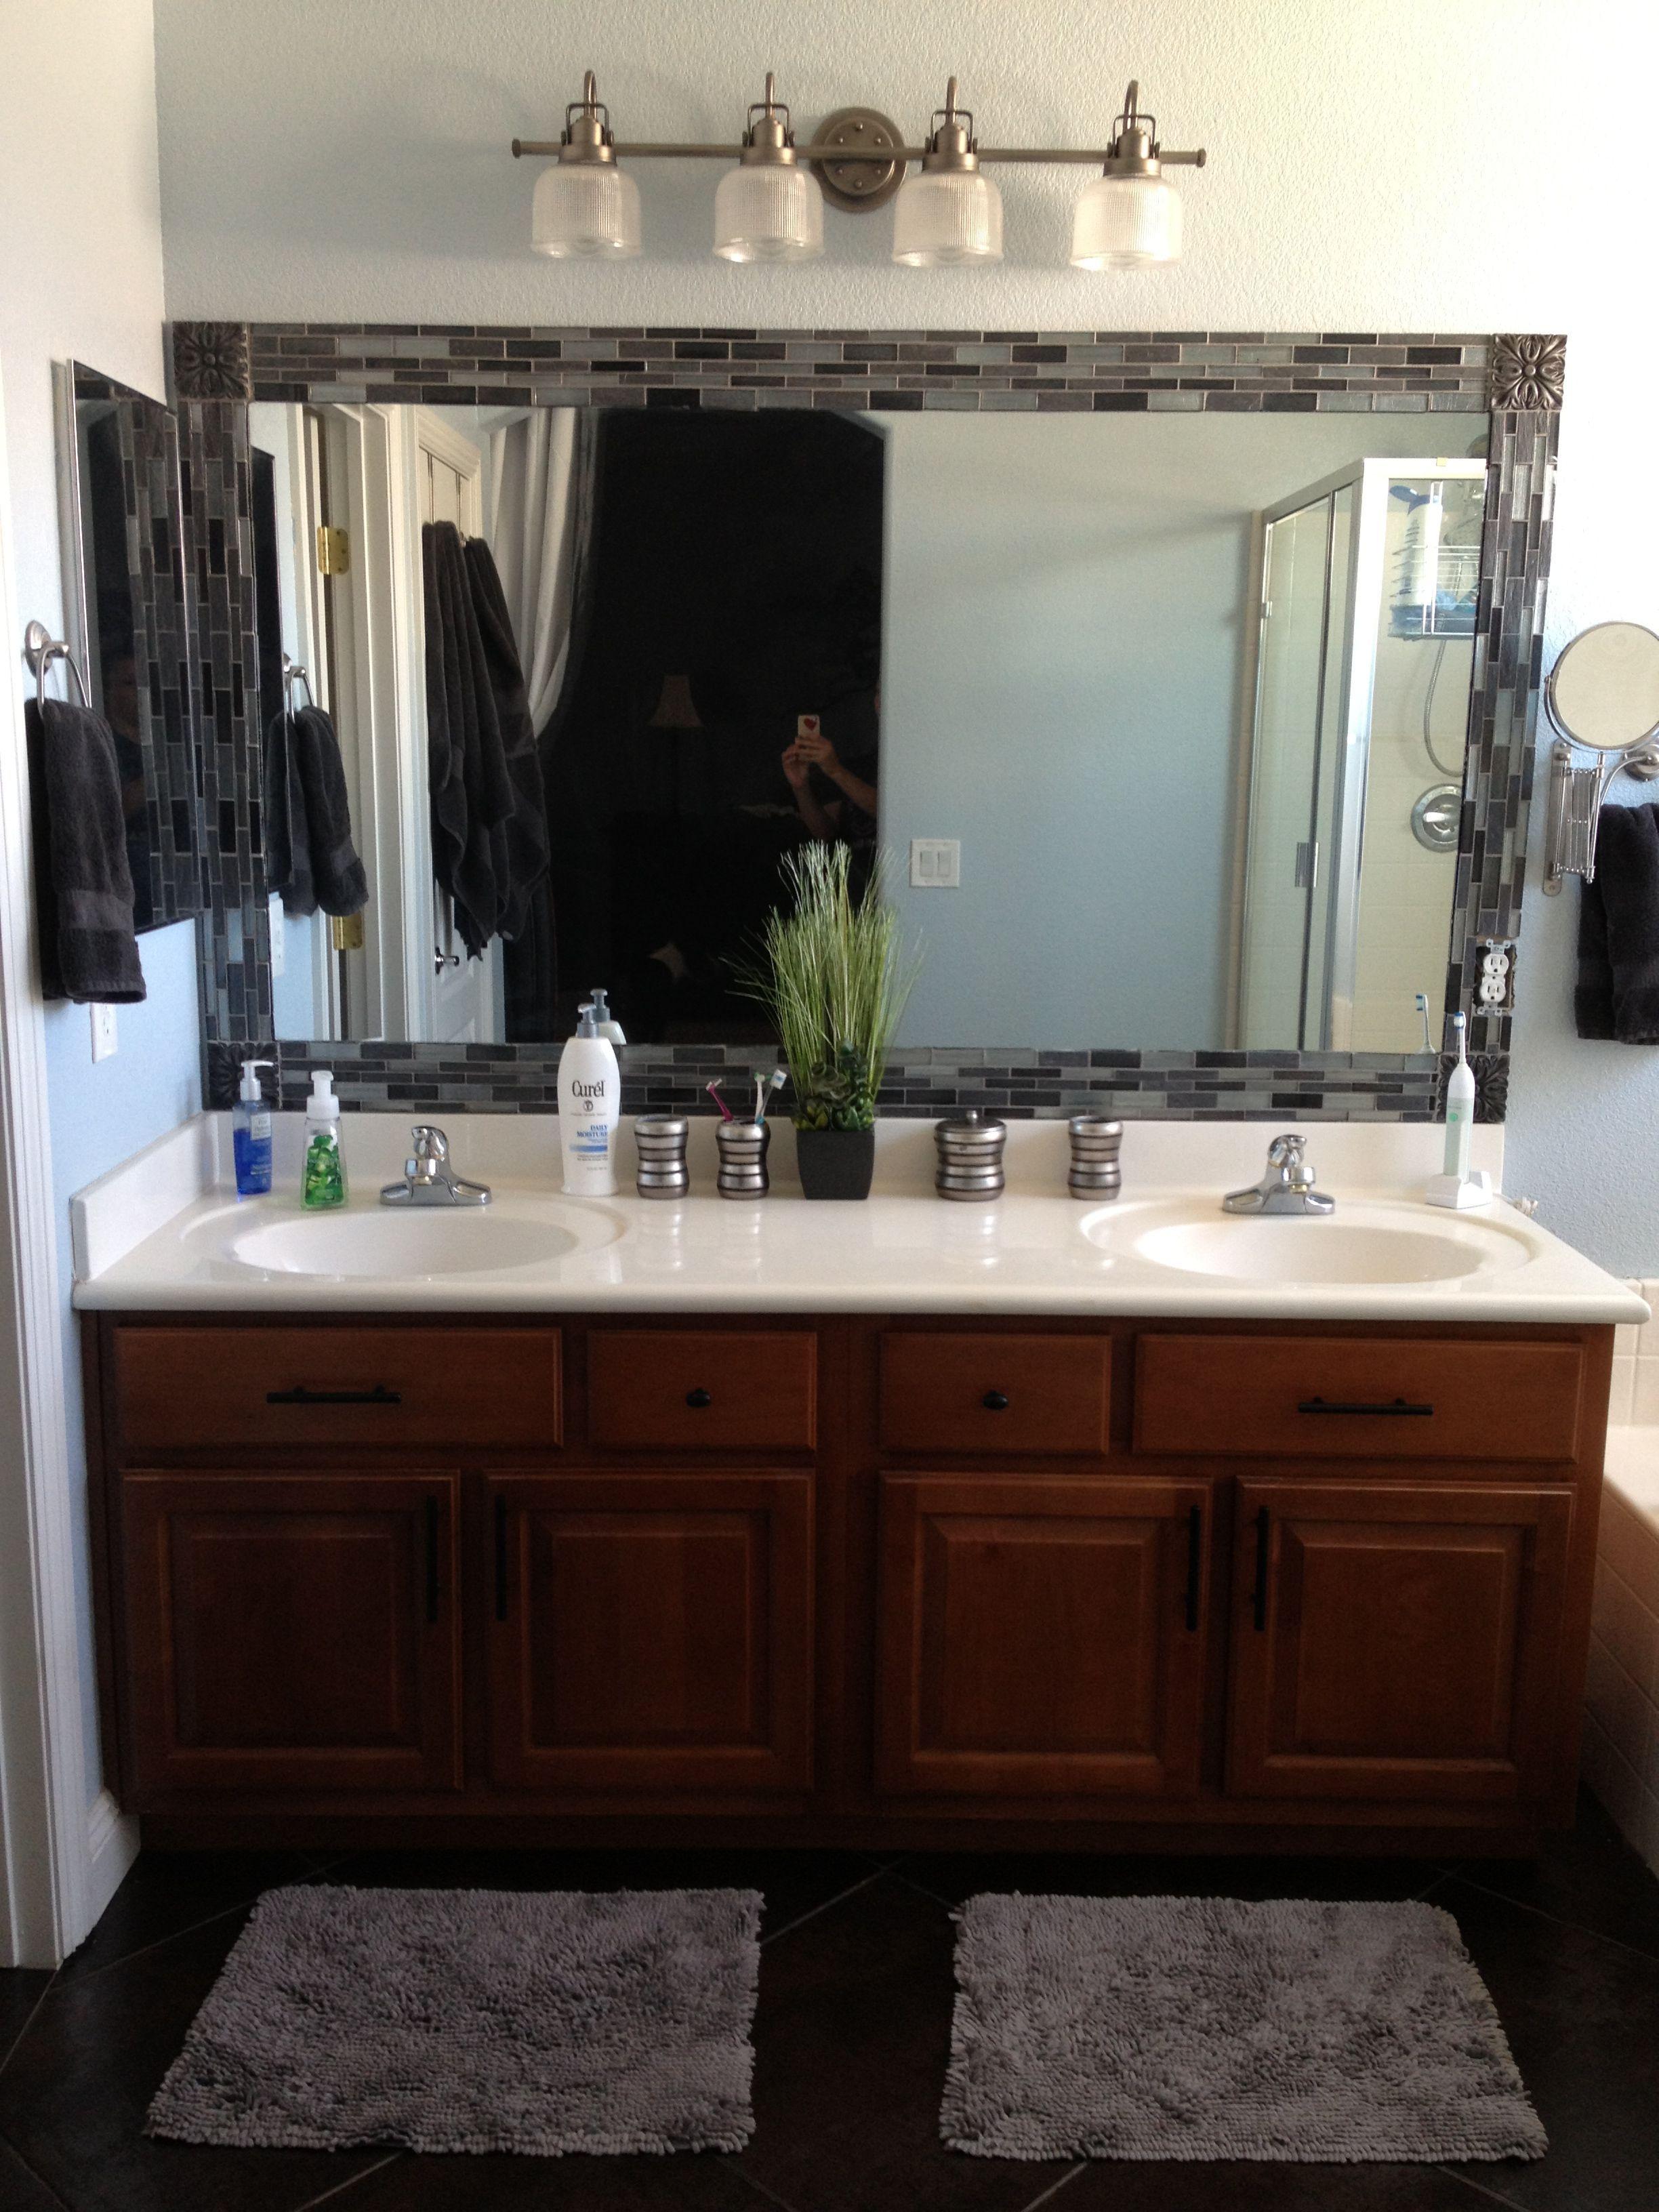 Read More About 51 Amazing Bathroom Mirror Design Ideas For Every Style Guestbathr Diy Mirror Frame Bathroom Bathroom Mirror Makeover Bathroom Mirror Design